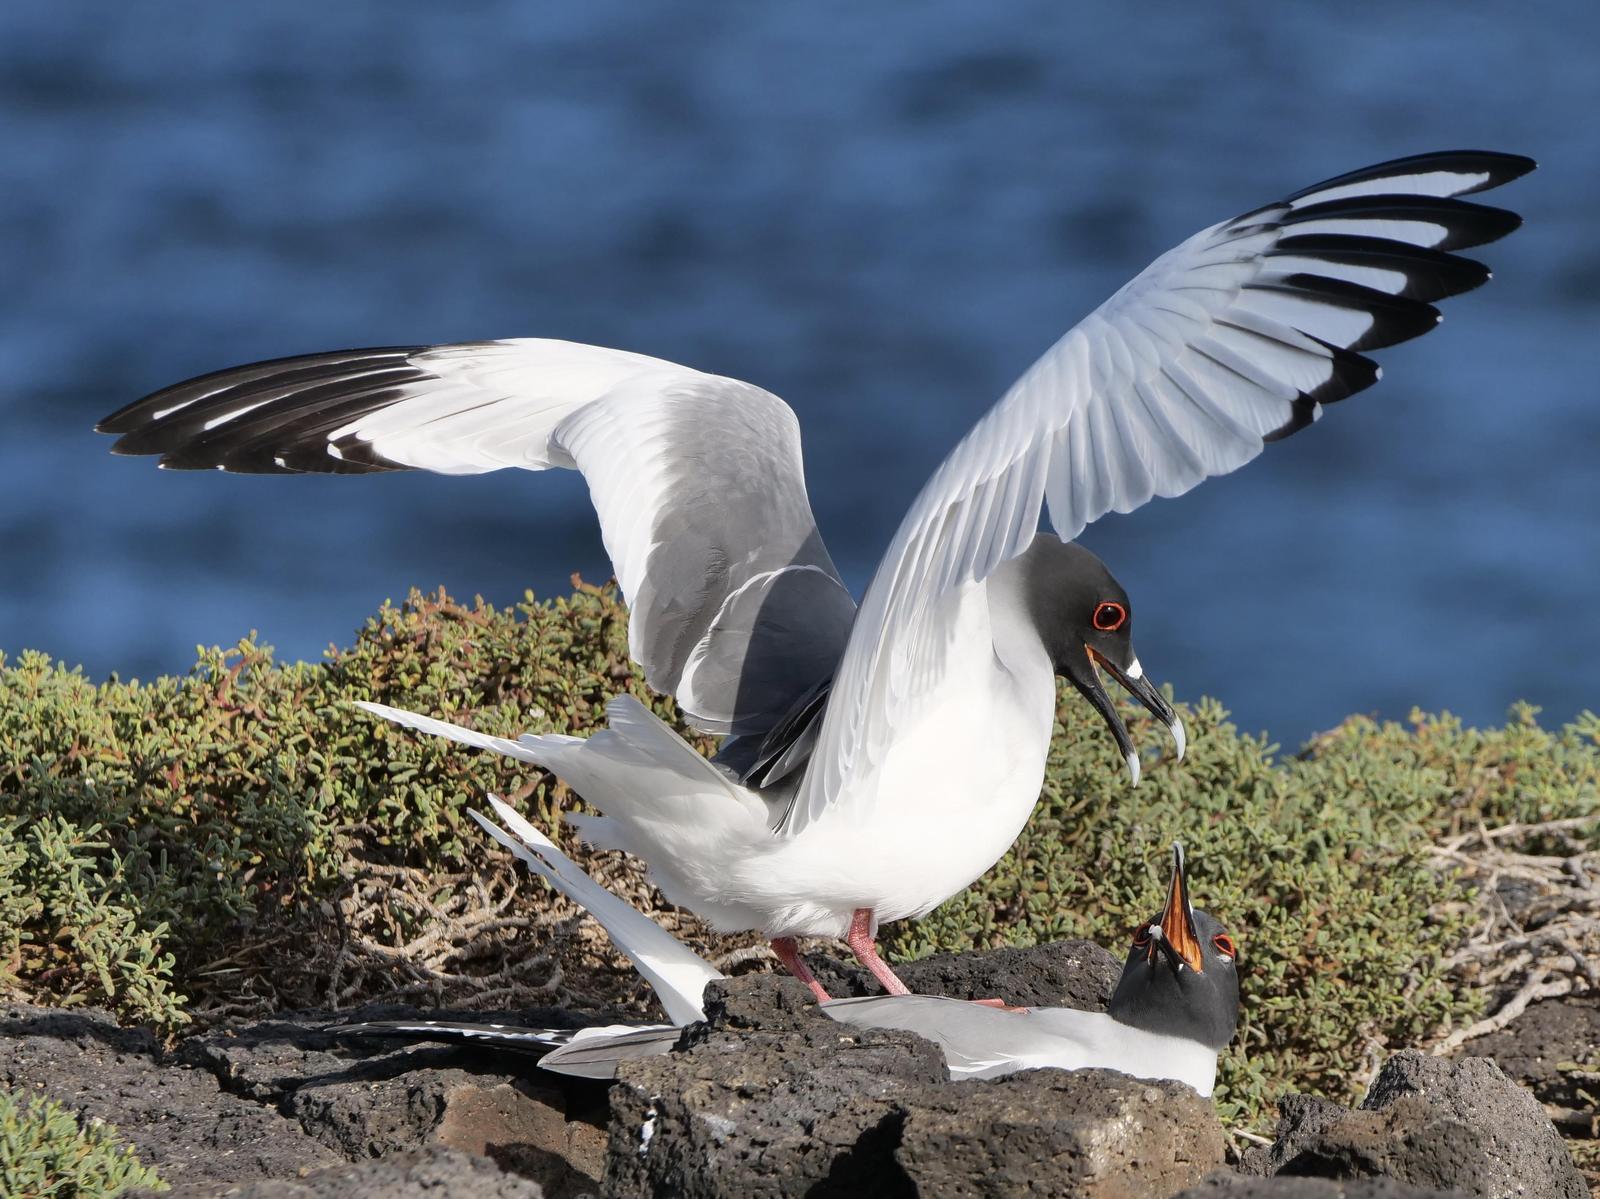 Swallow-tailed Gull Photo by A G Wynn